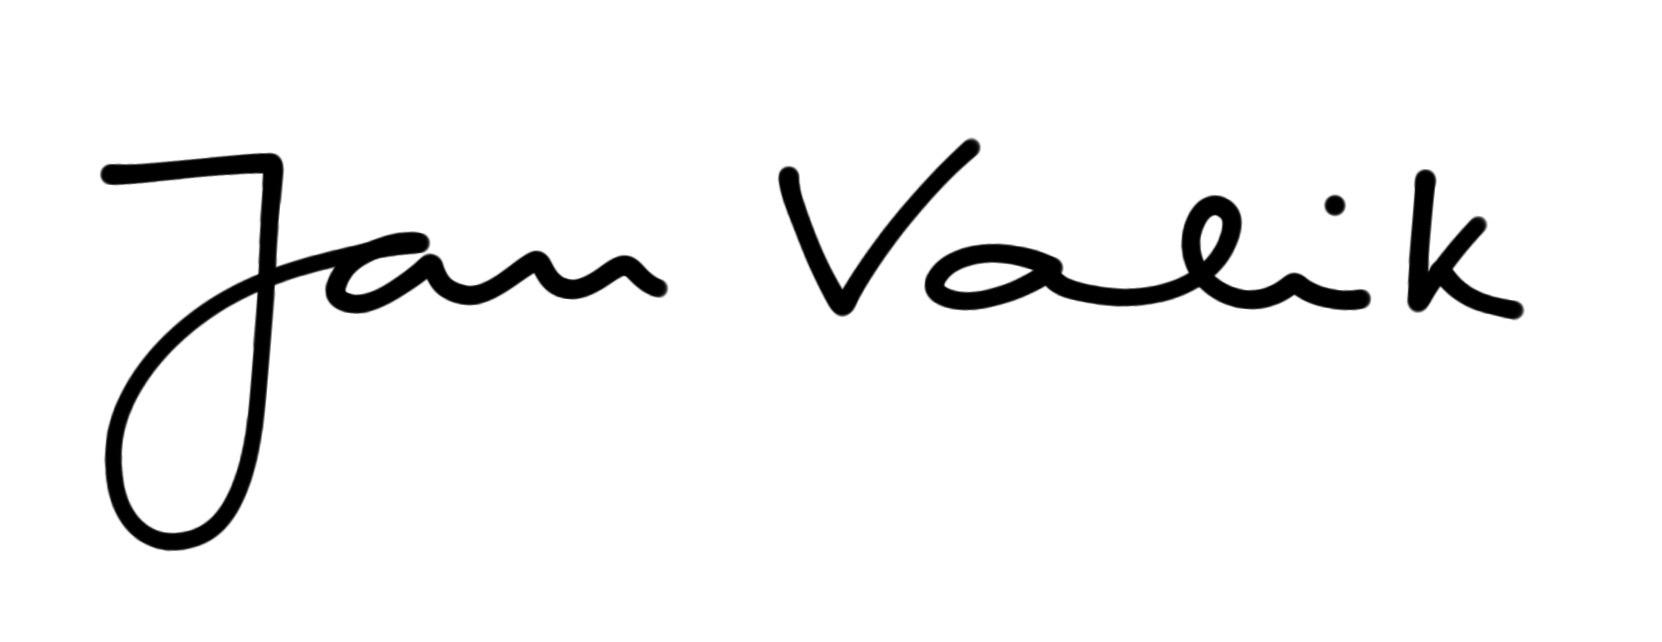 Jan  Valik's Signature